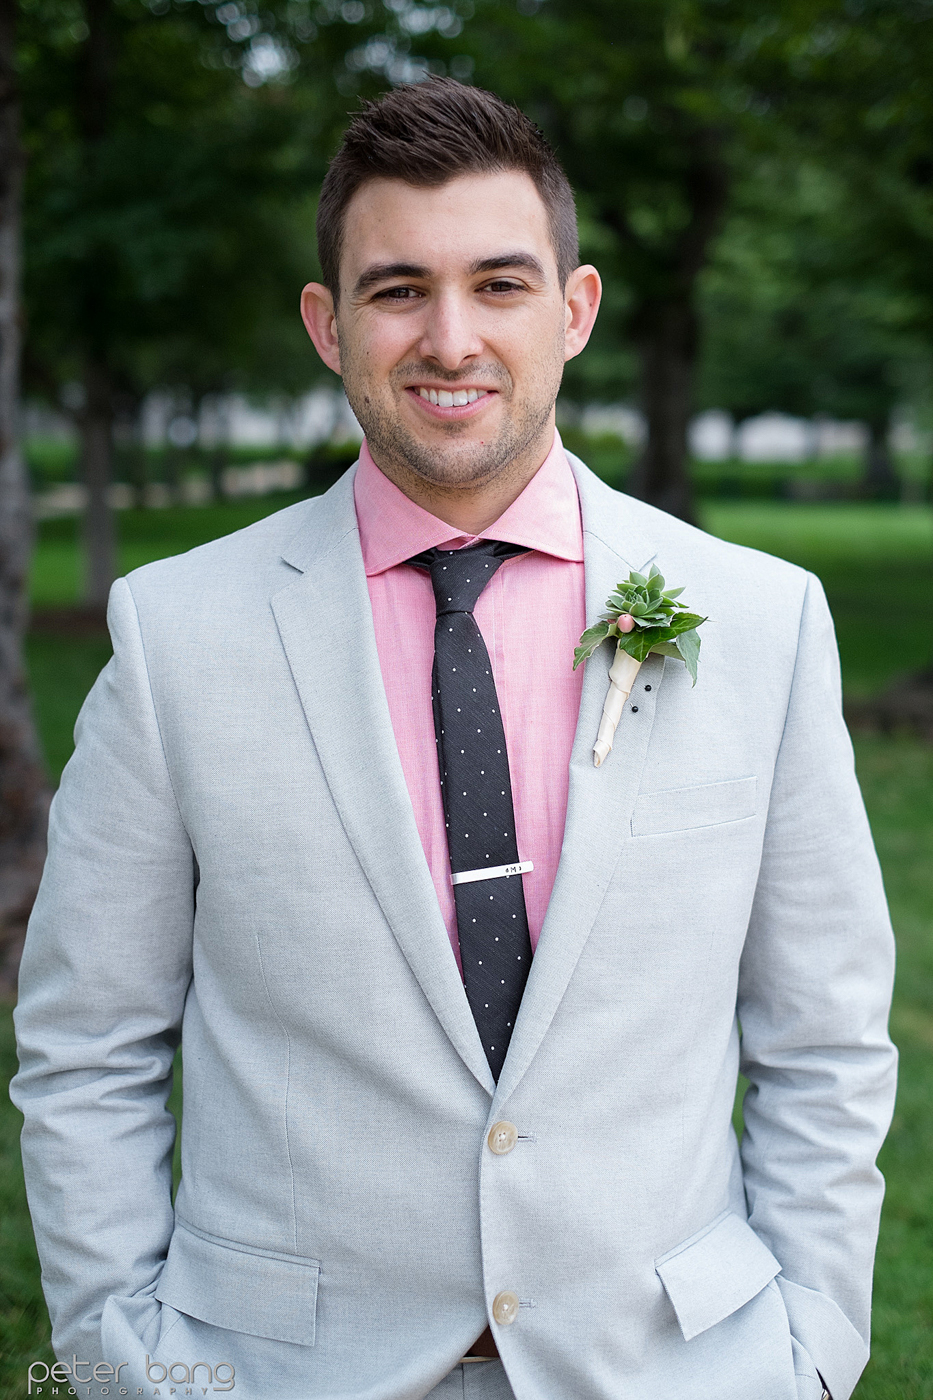 Eastern Market Weddings | Washington DC Wedding Planner